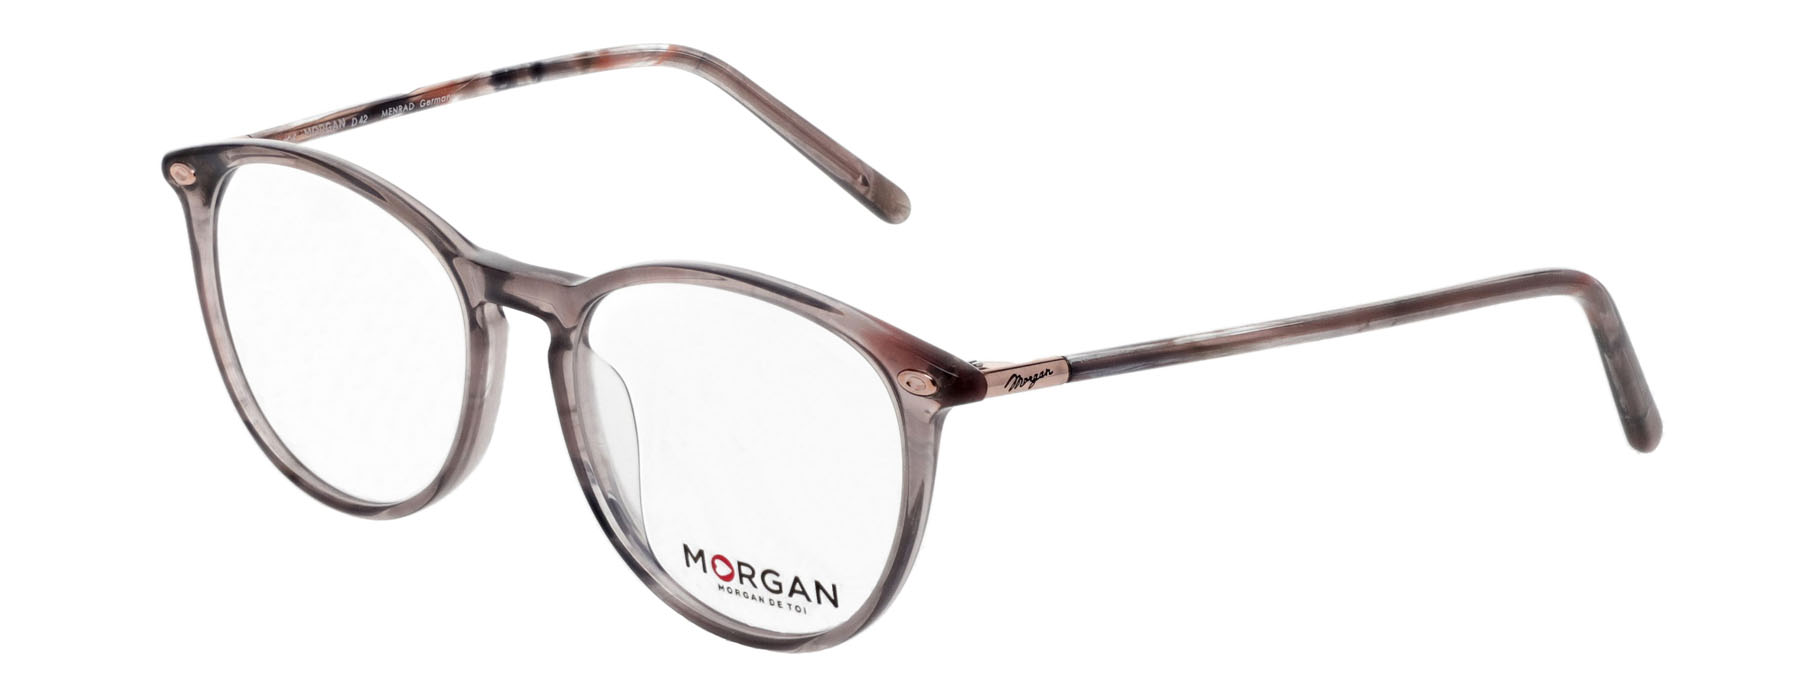 Morgan 202022 4629